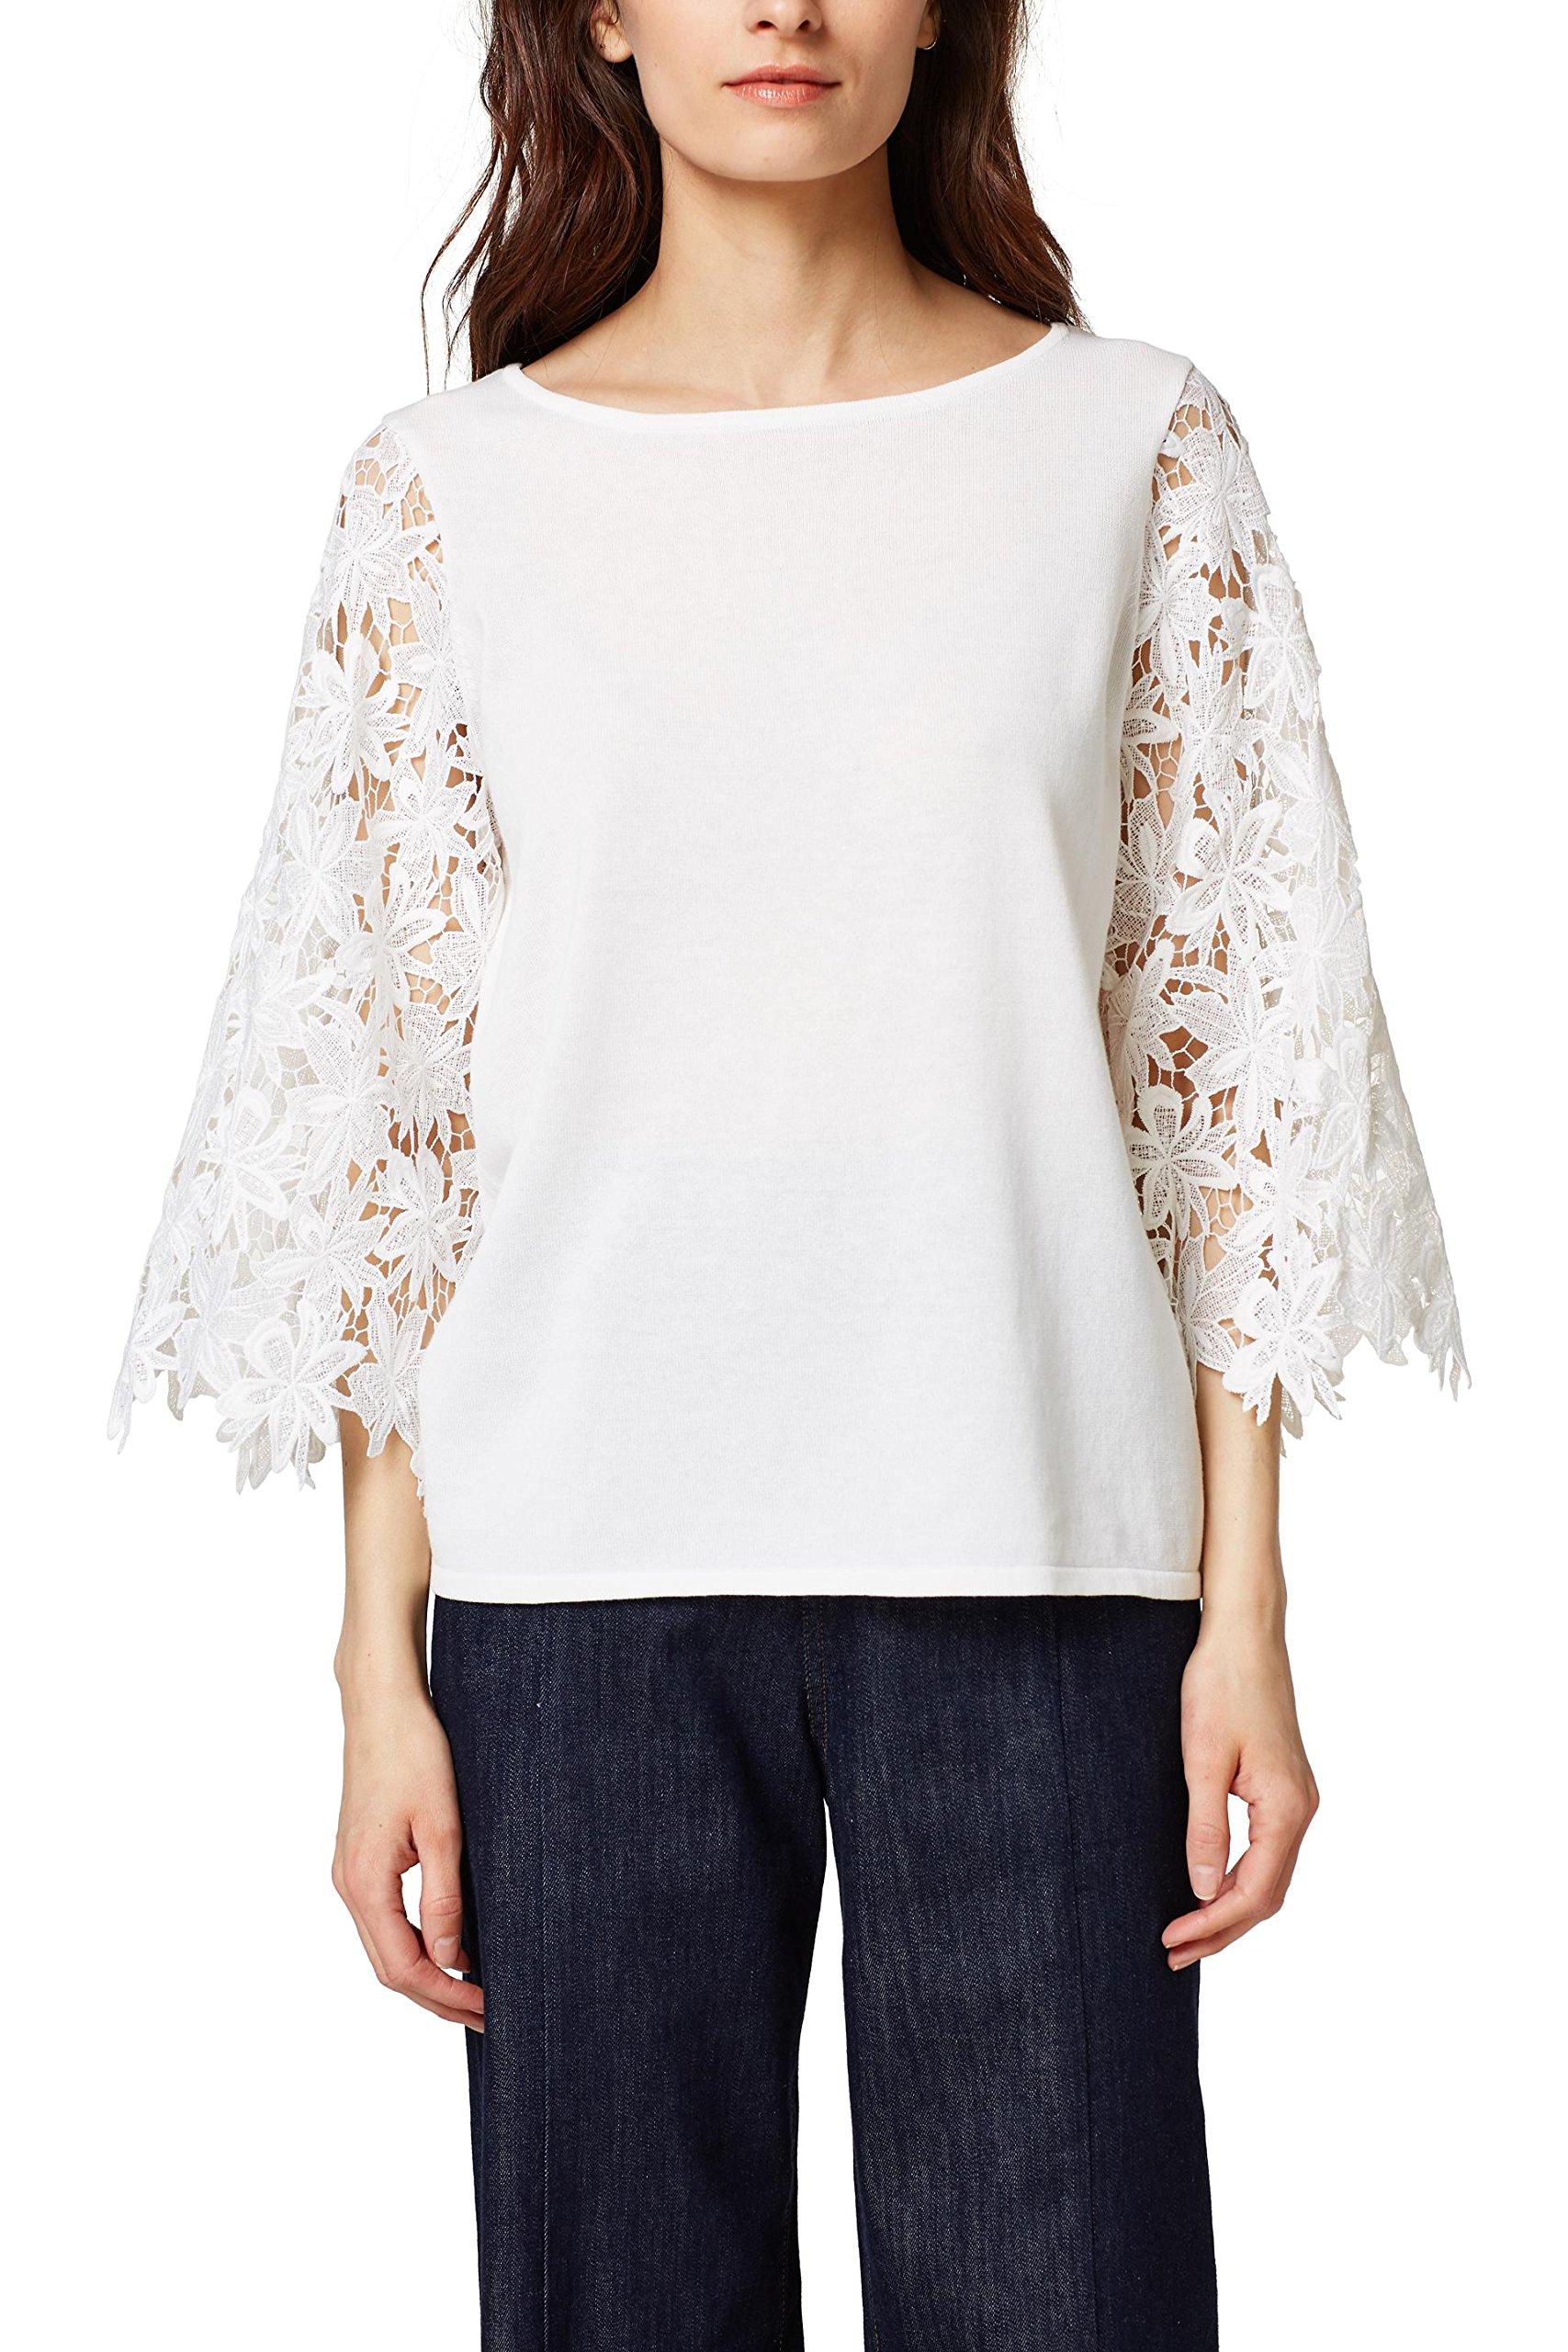 Collection Femme PullBlancoff 110Medium Esprit White 038eo1i002 OP0knw